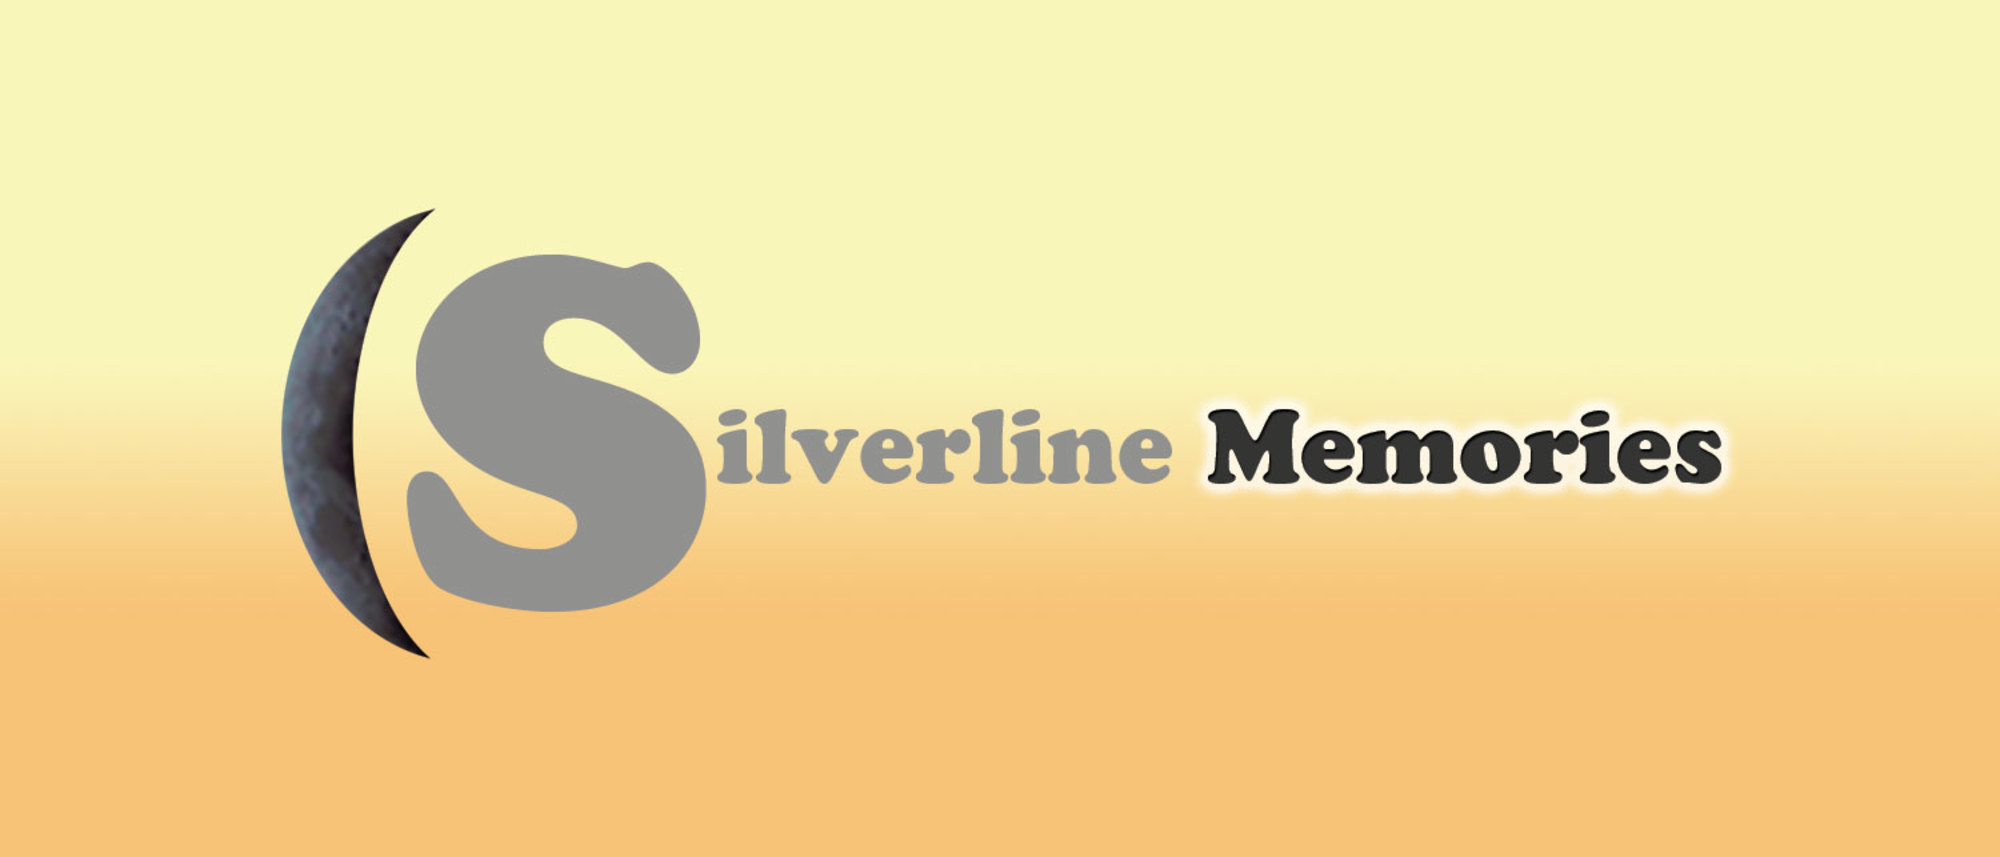 Silverlinememoriescio